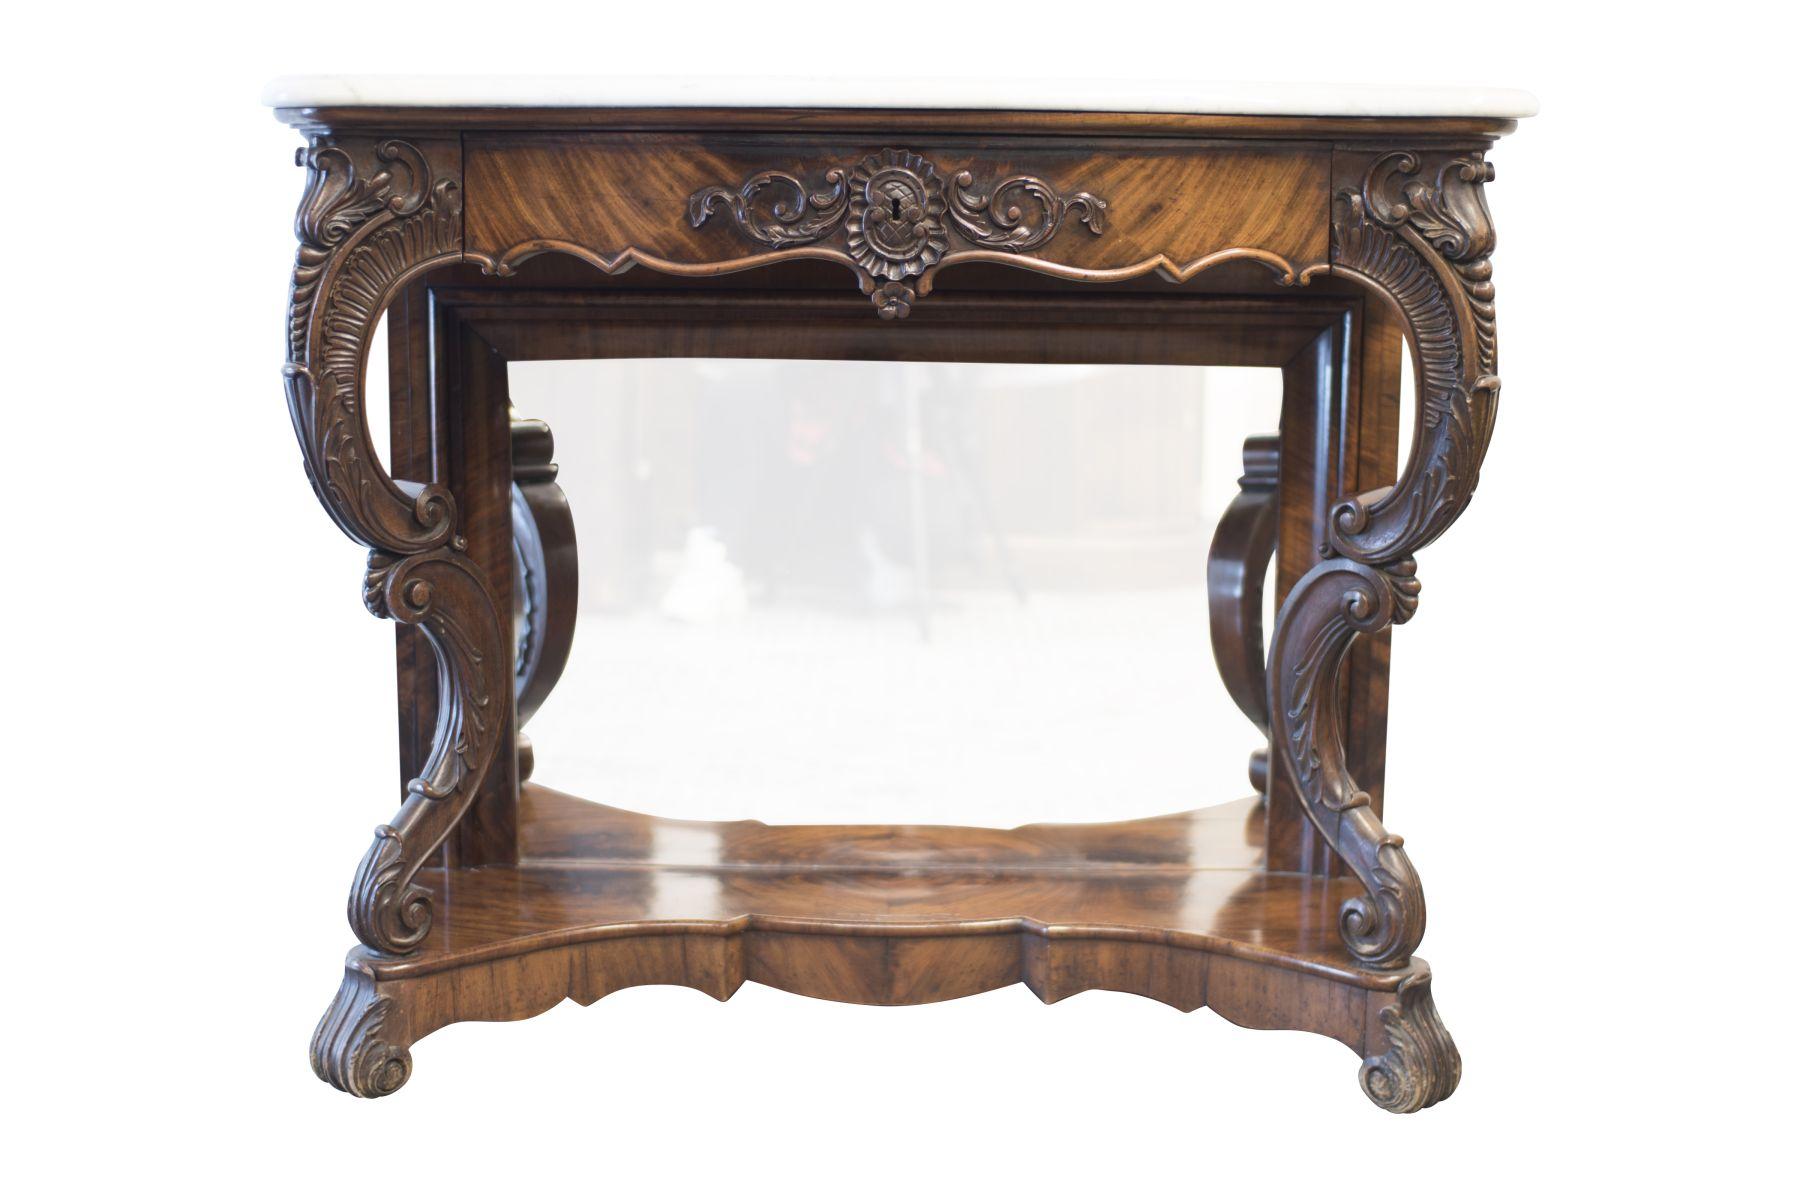 #38 Baroque Sideboard with Mirror and Marble Top | Barock Buffet mit Spiegel und Marmorplatte Image